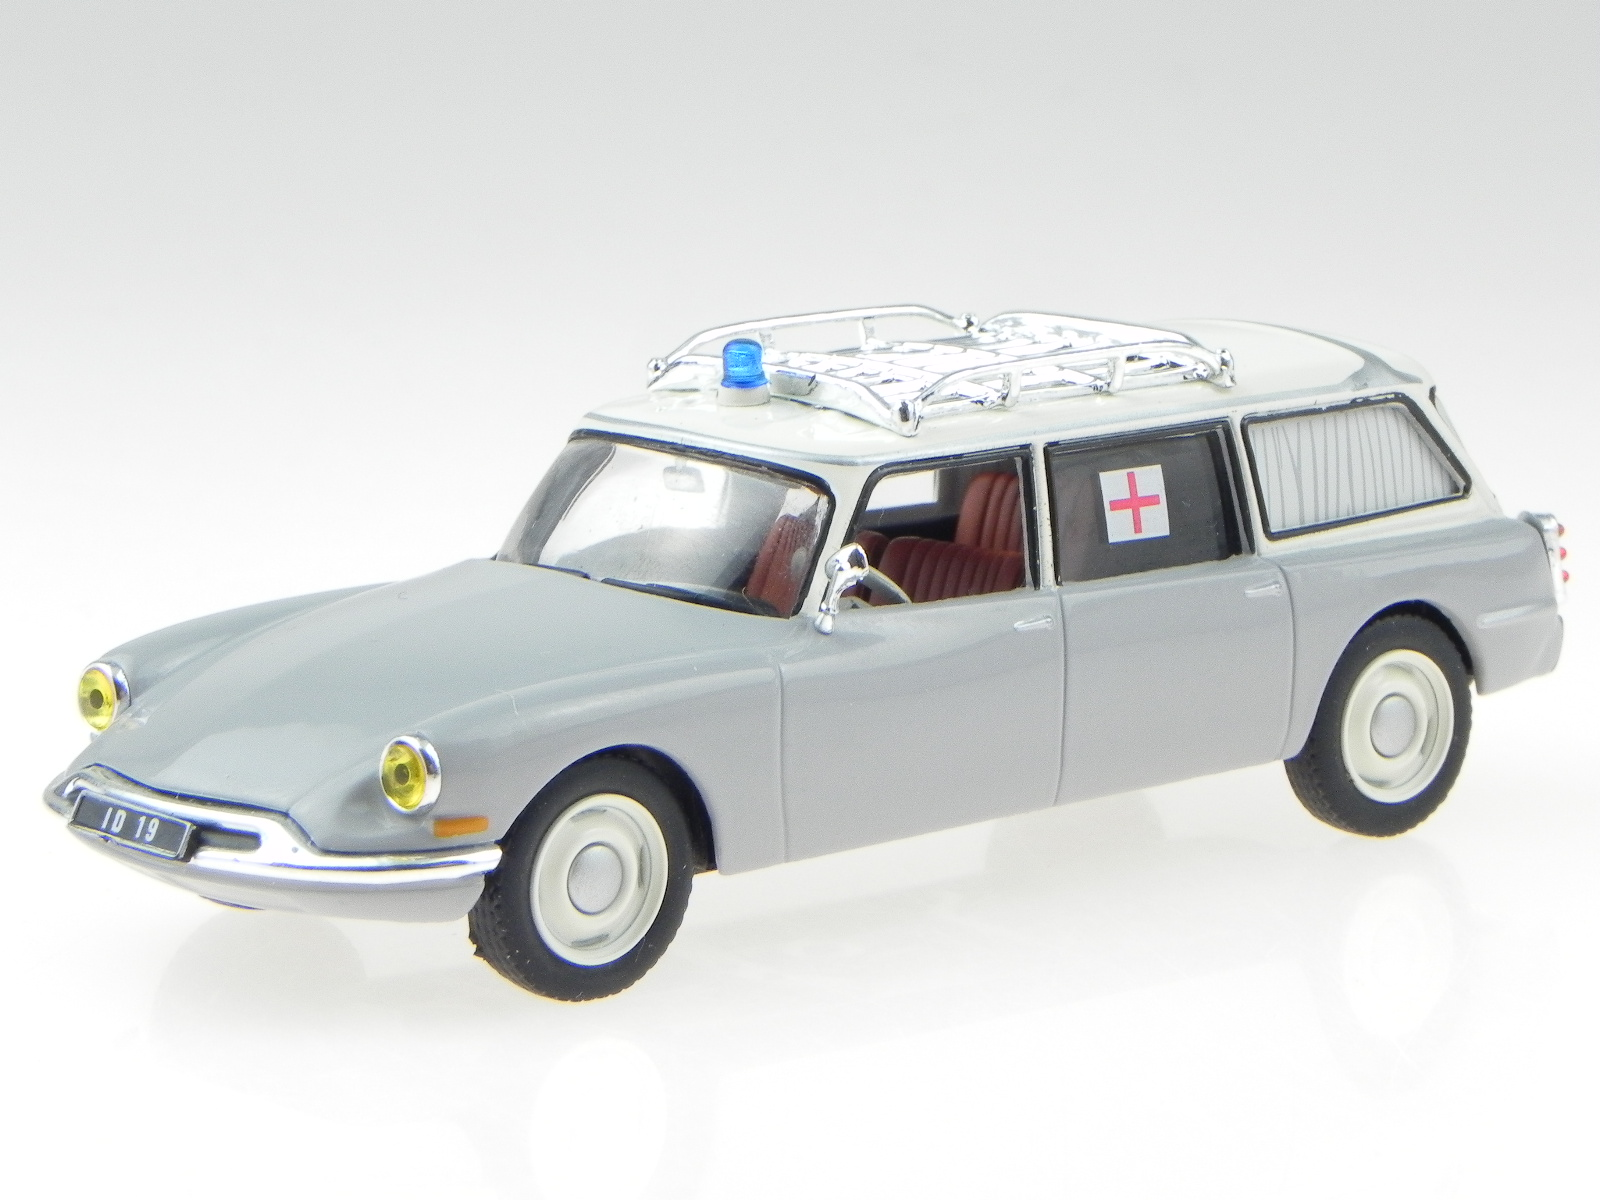 Ambulance Collection Atlas 1:43 Citroen ID 19 Diecast car model